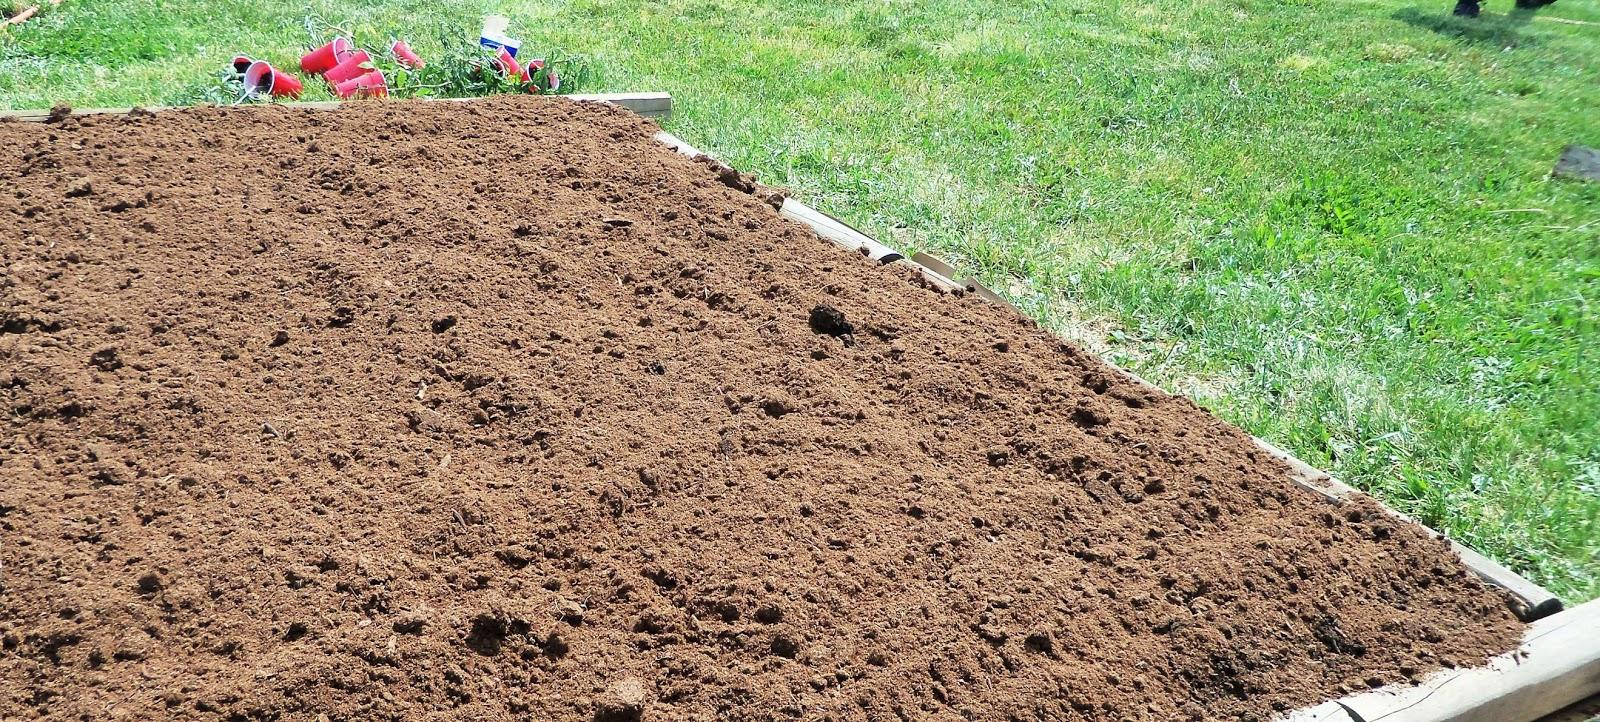 Grandma bonnie 39 s closet how to start a weed free raised for Backyard soil